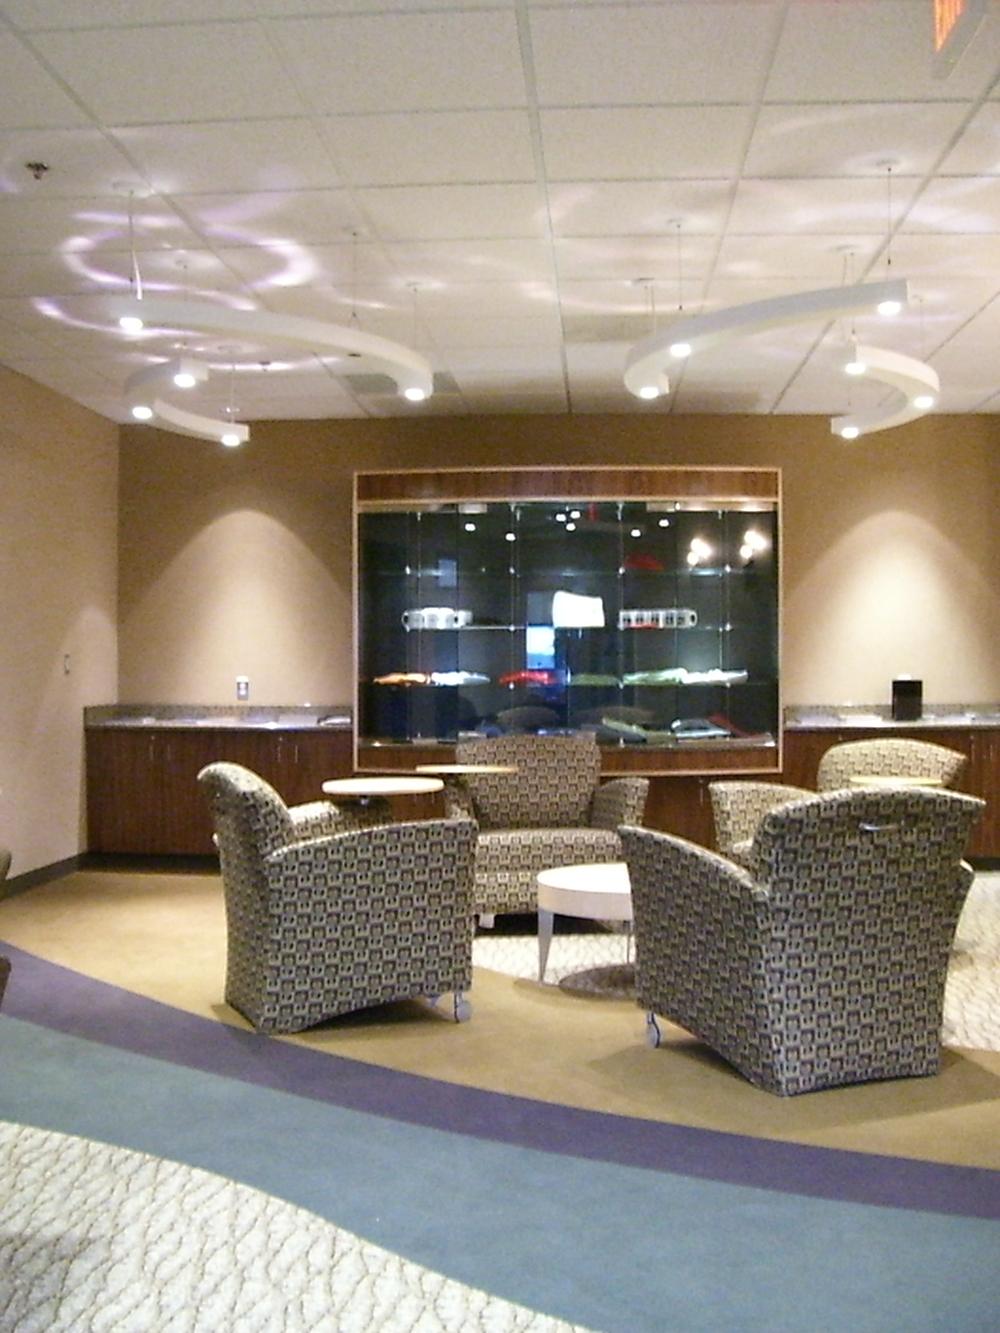 Pilot-lounge-cool-lights